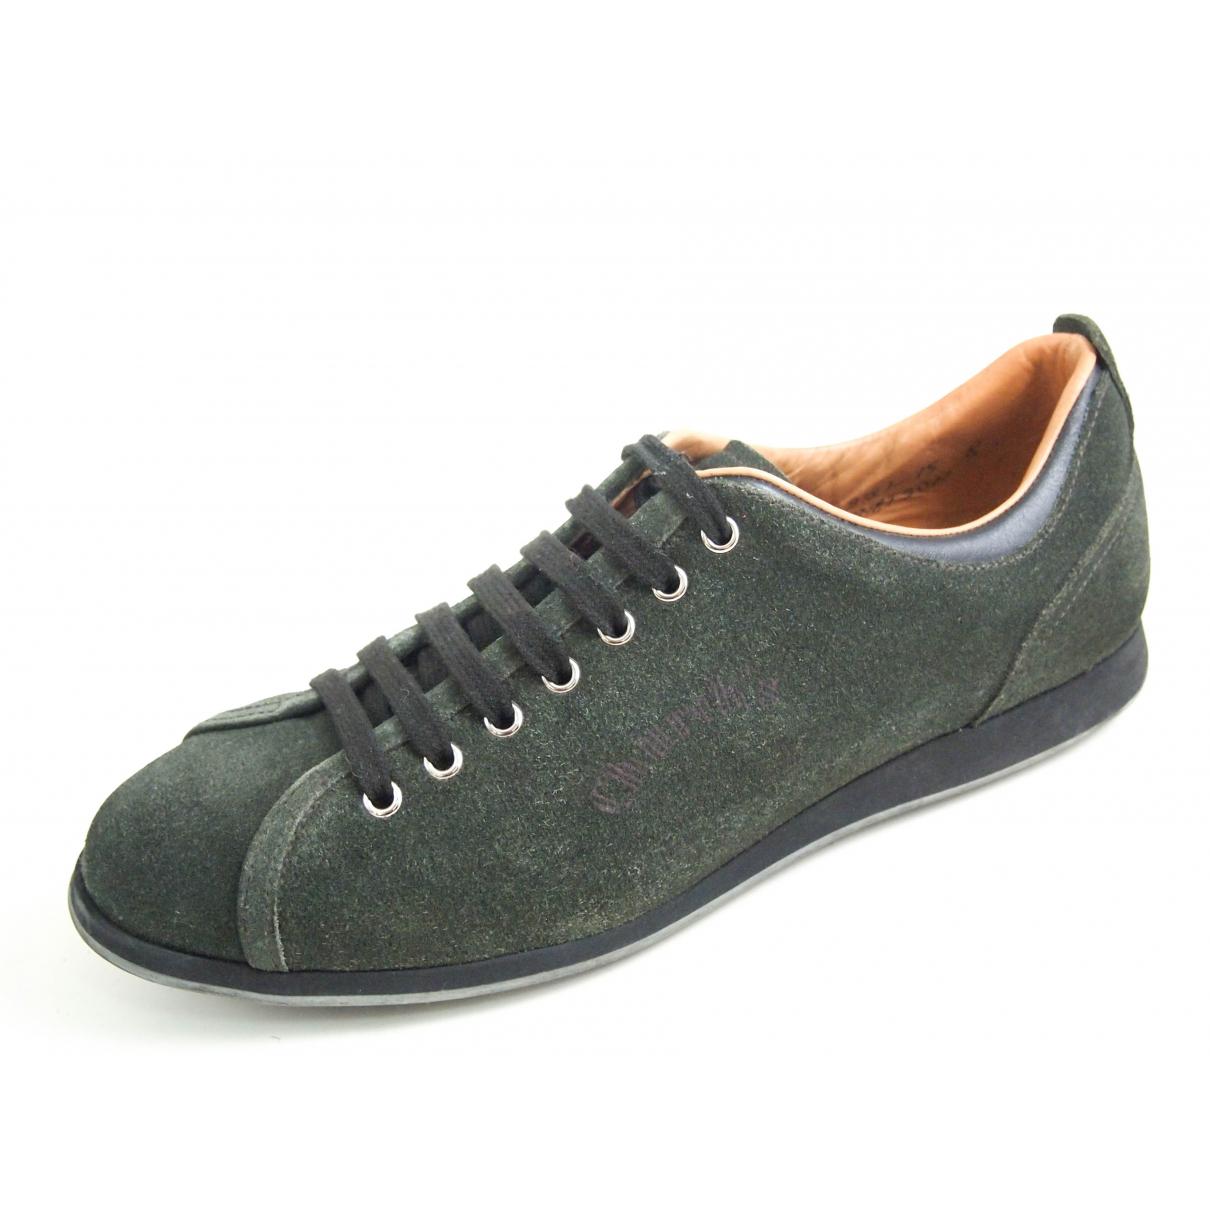 Churchs \N Sneakers in  Gruen Veloursleder